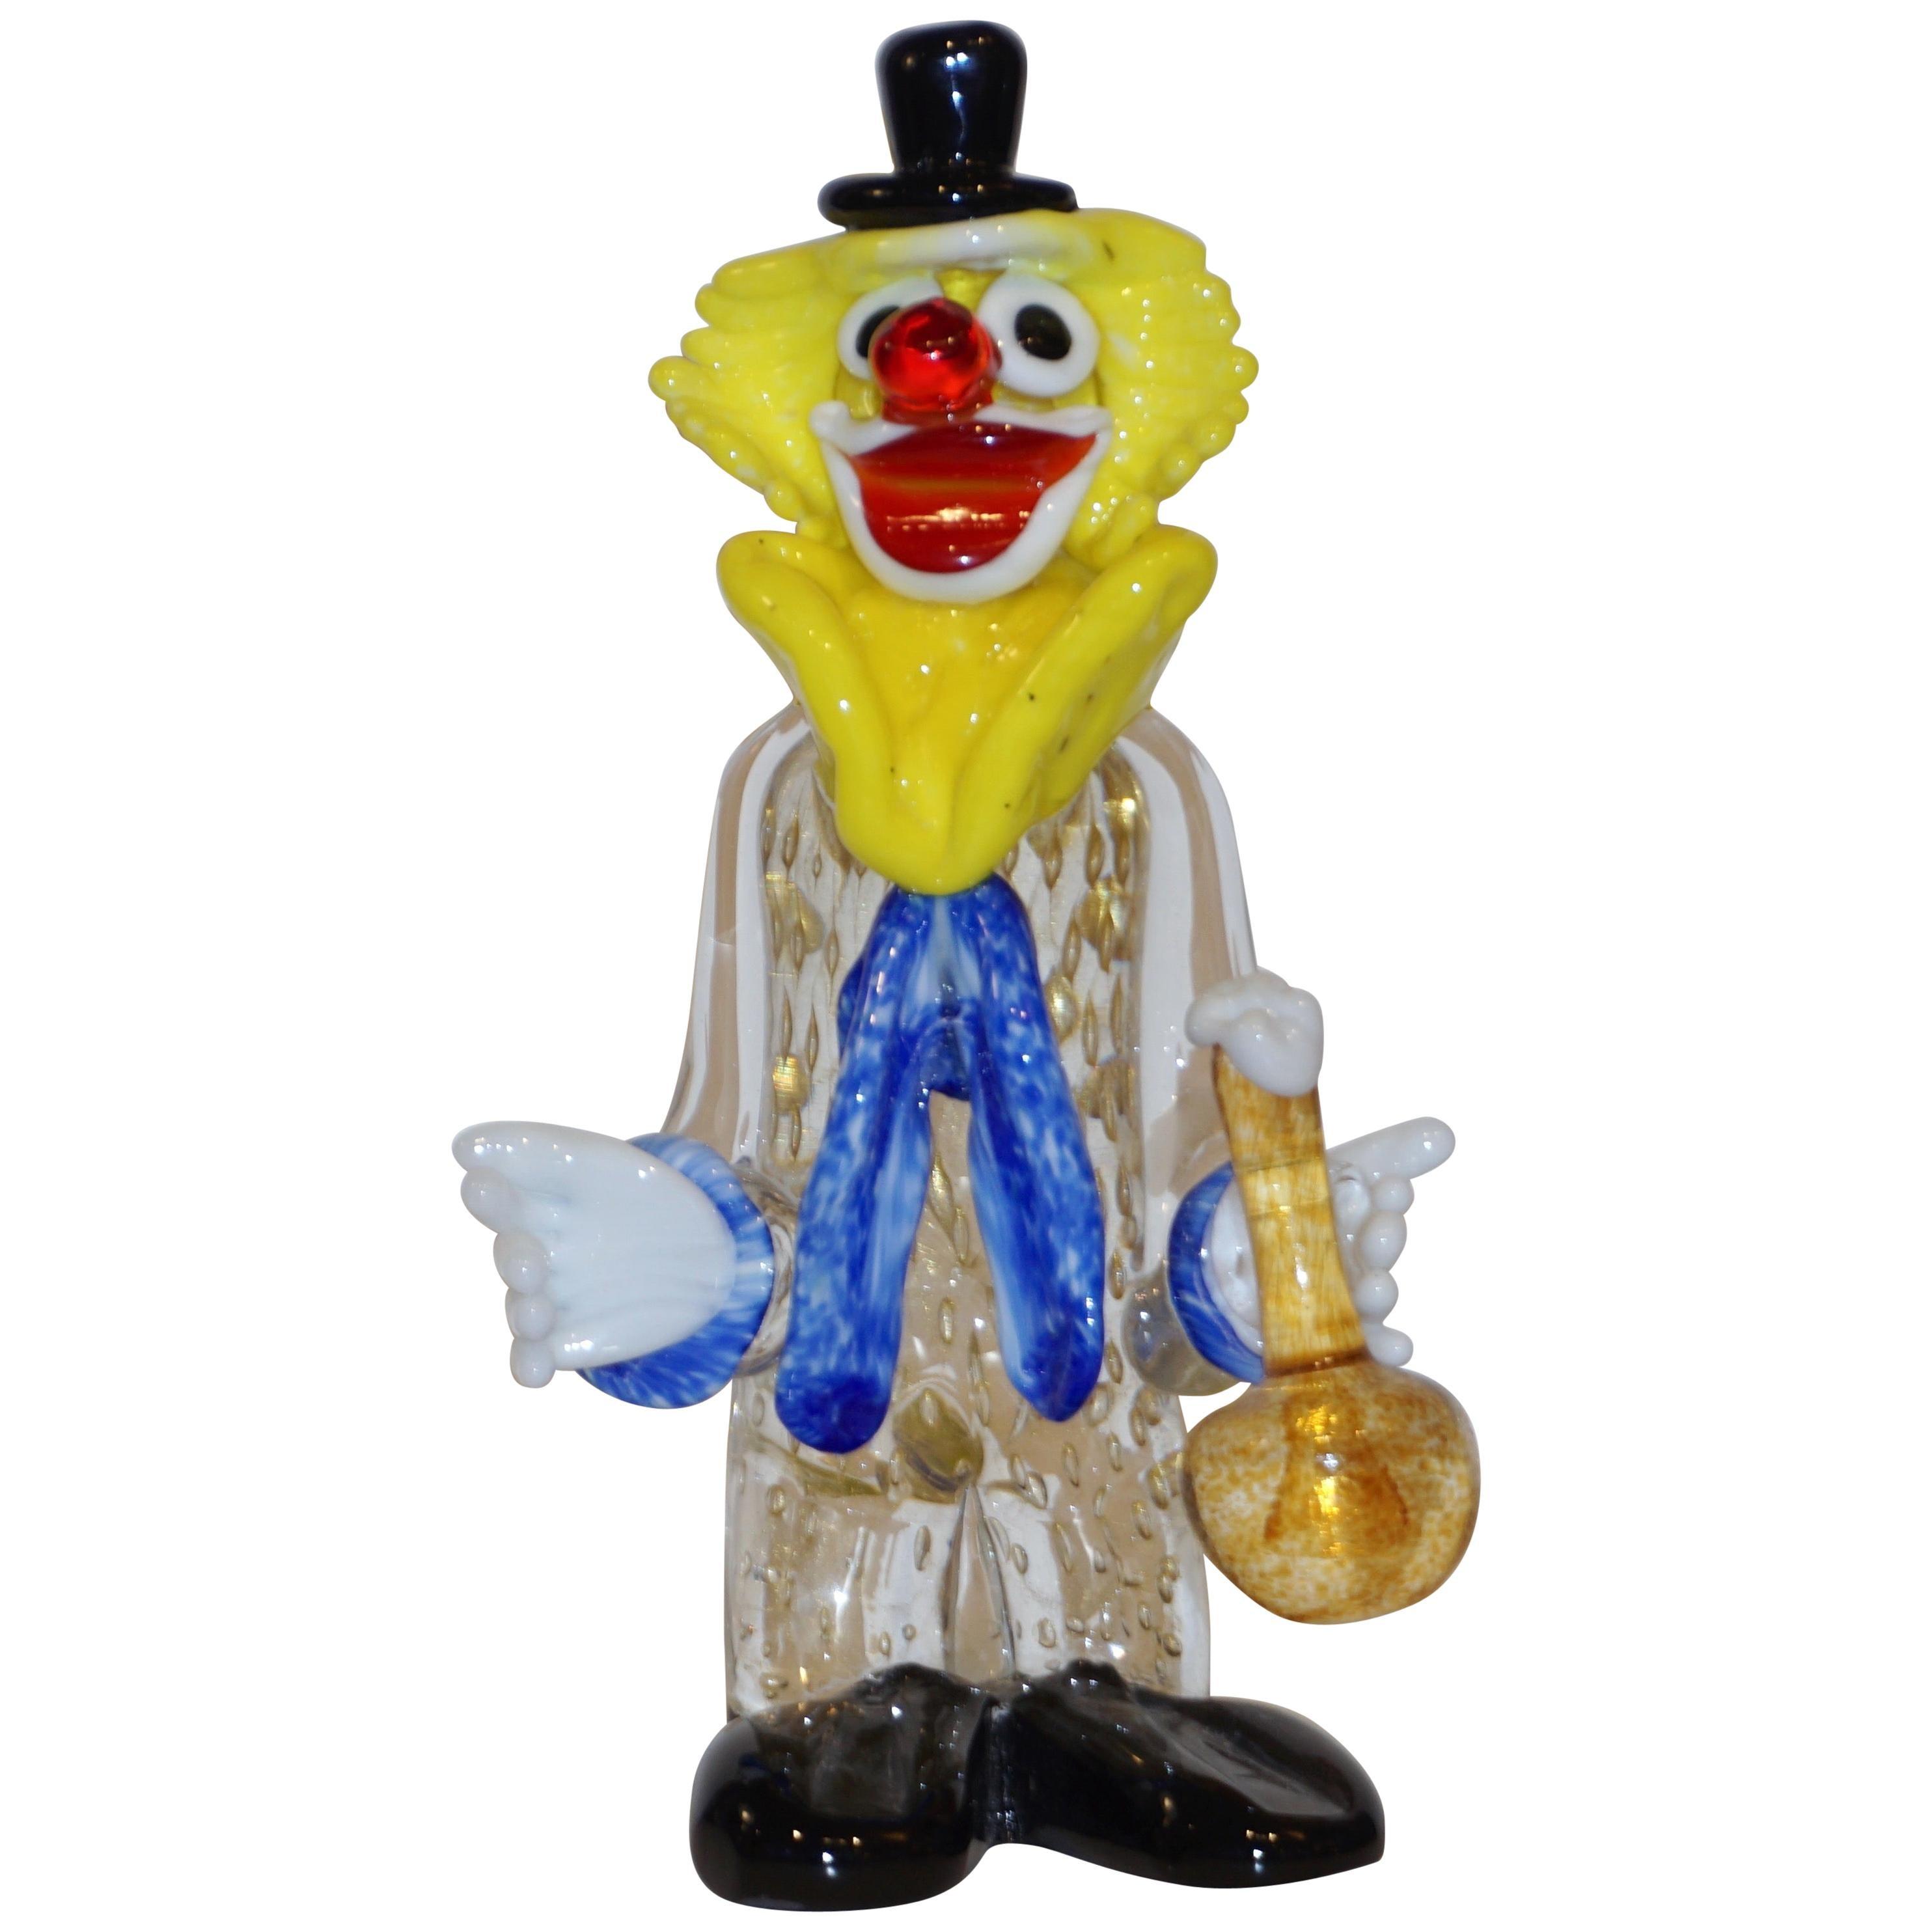 Modern Italian Yellow Black Murano Glass Clown Sculpture with Bottle & Blue Tie